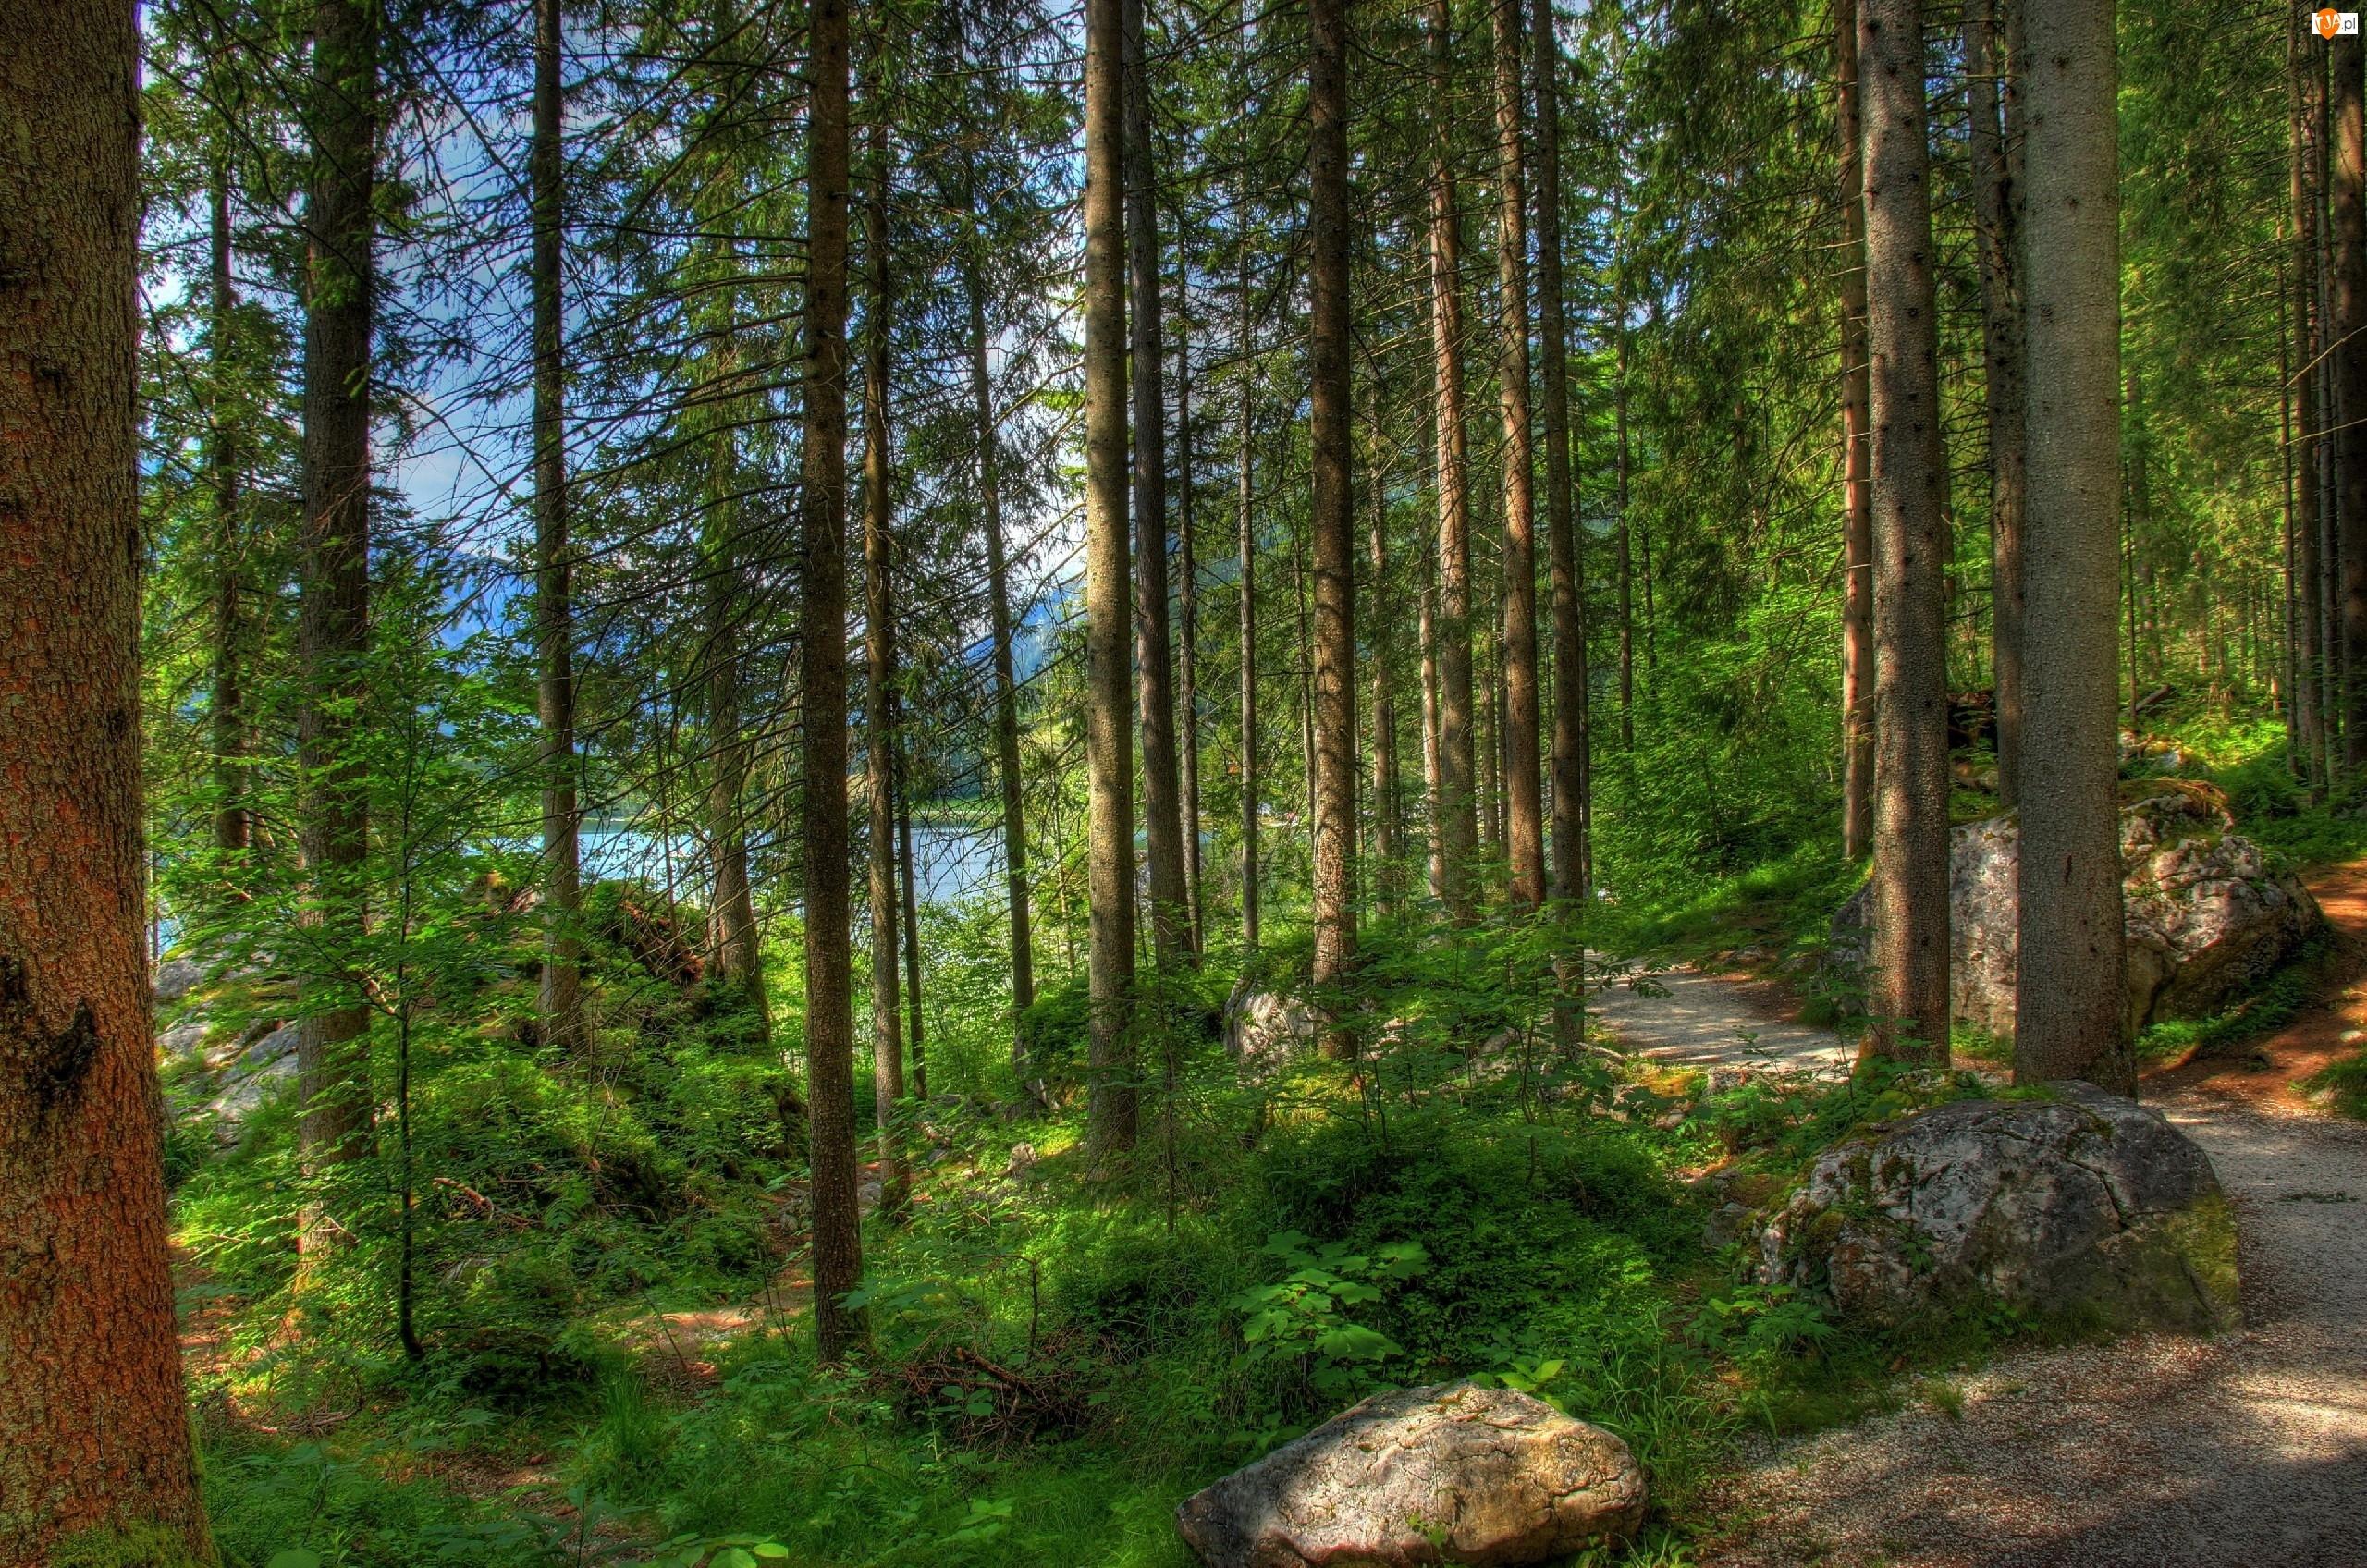 Las, Cienie, Droga, Jezioro